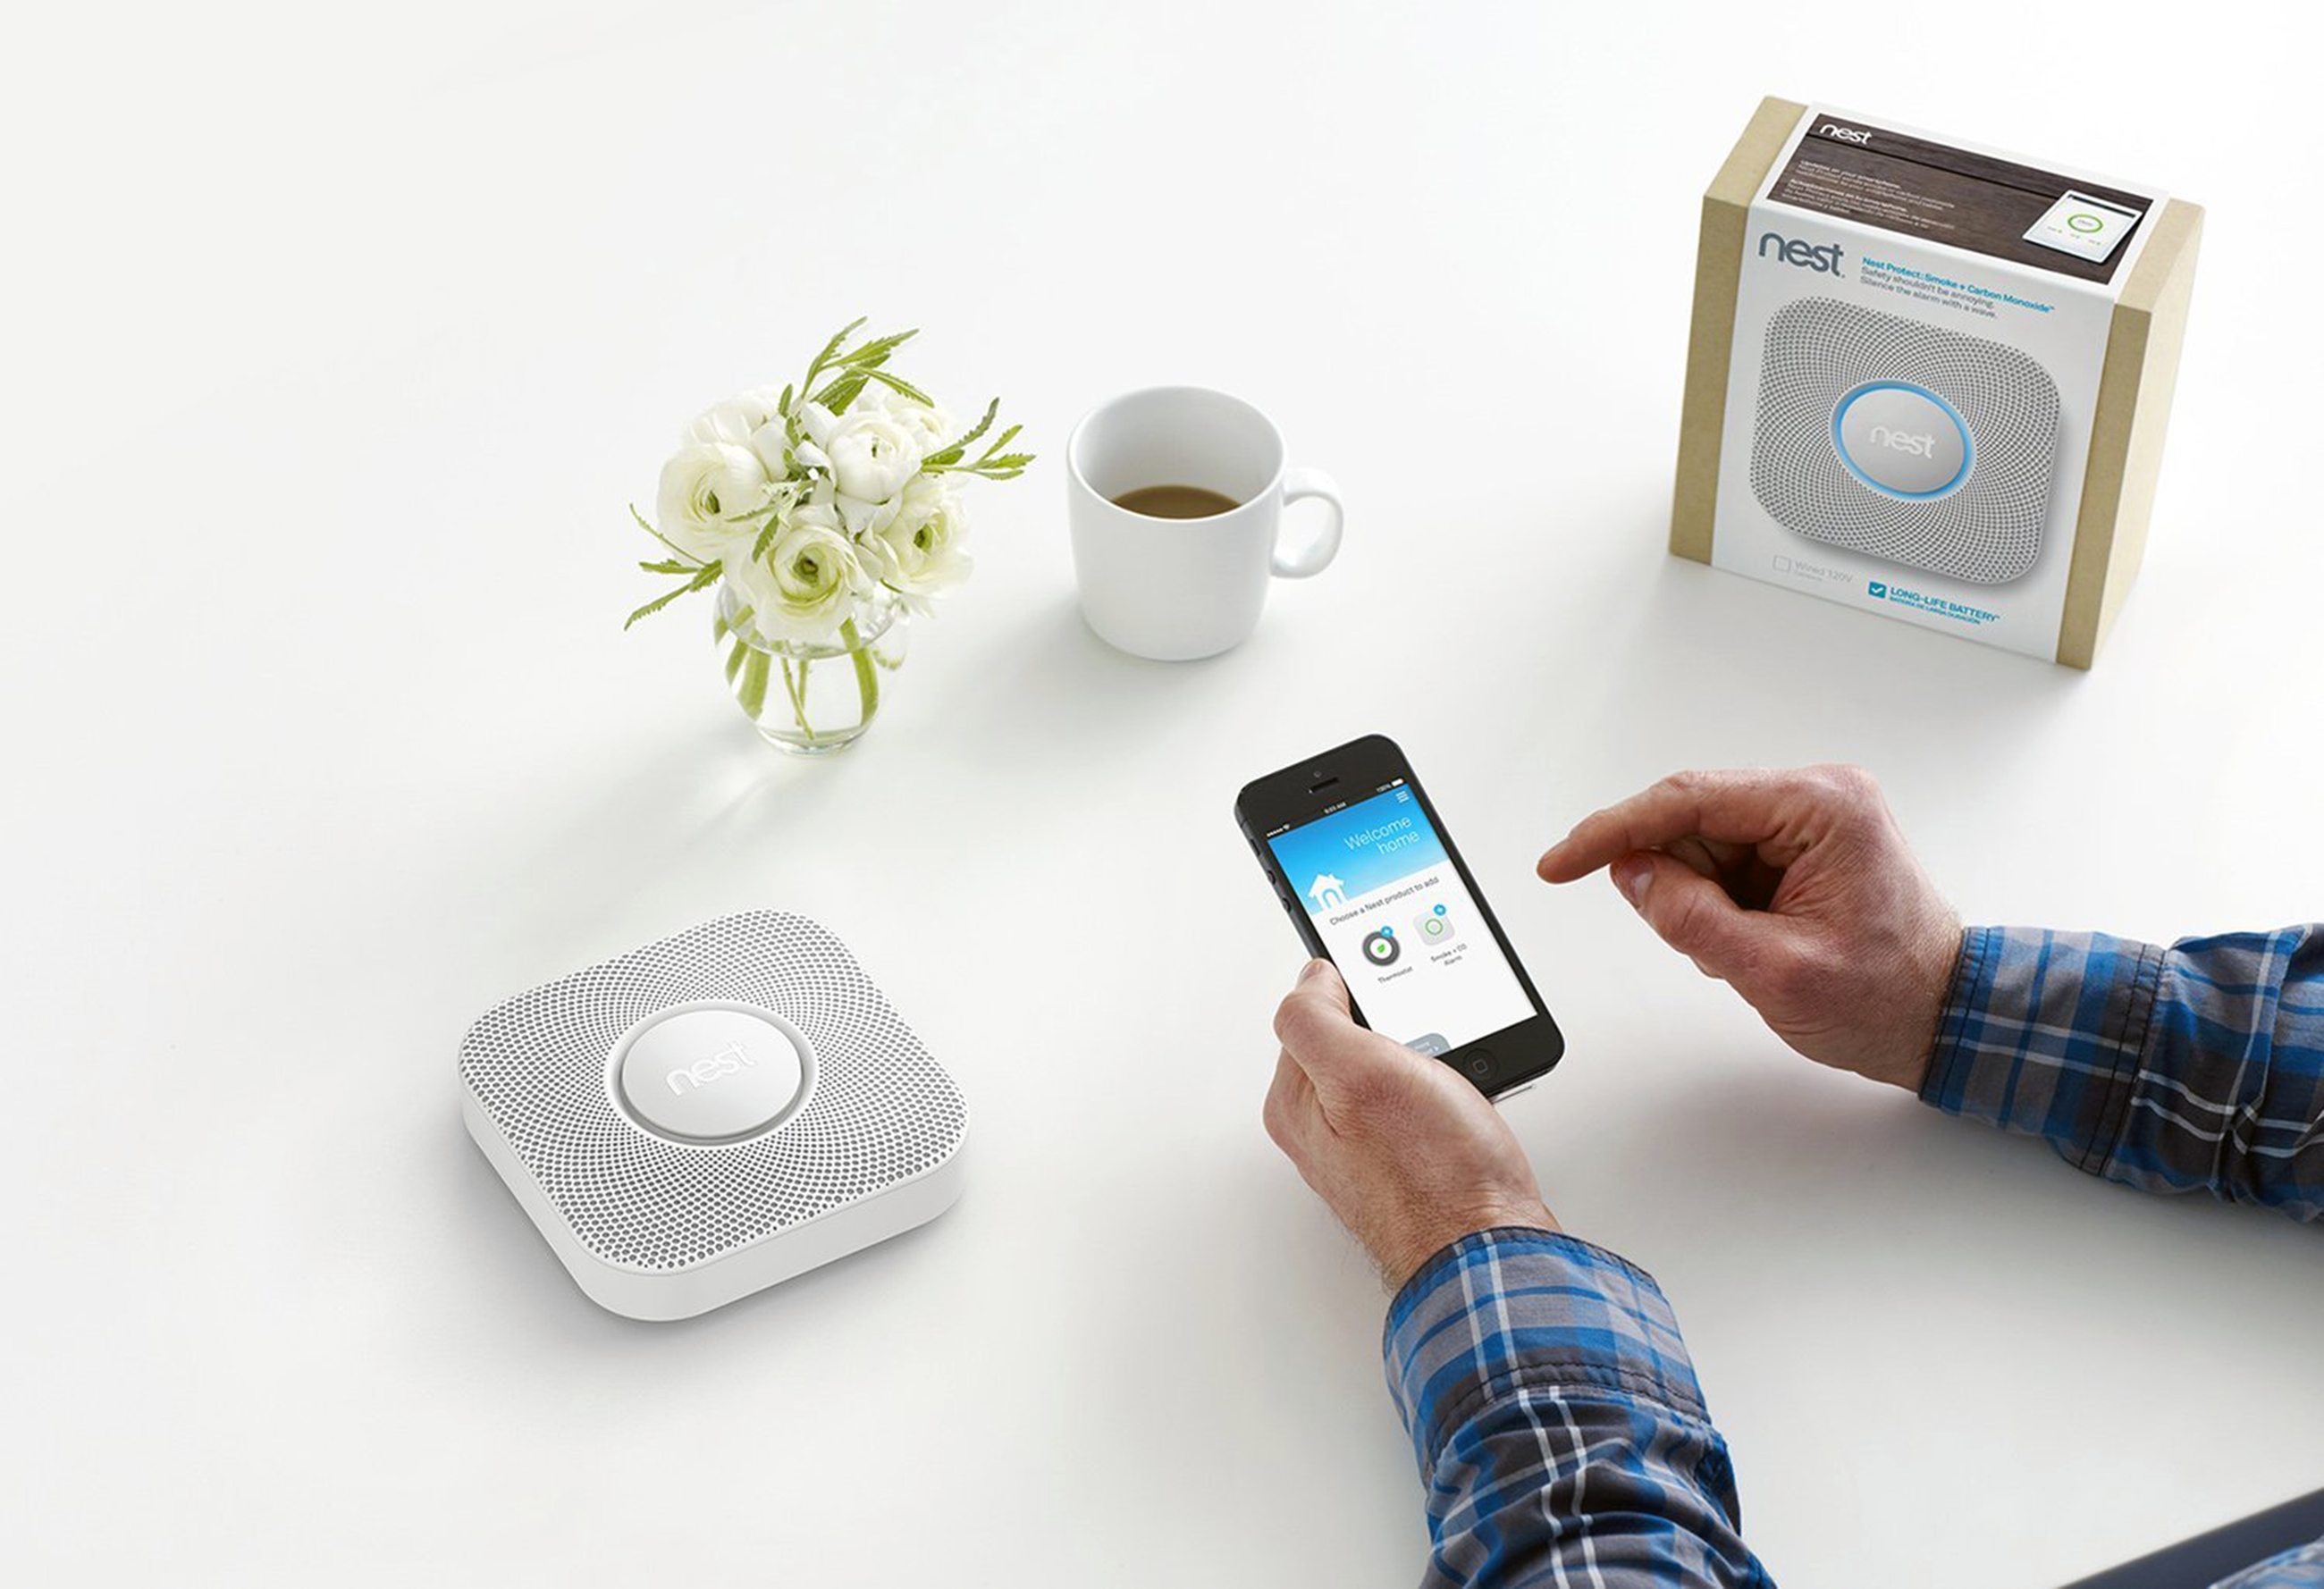 designapplause nest protect smoke alarm. Black Bedroom Furniture Sets. Home Design Ideas